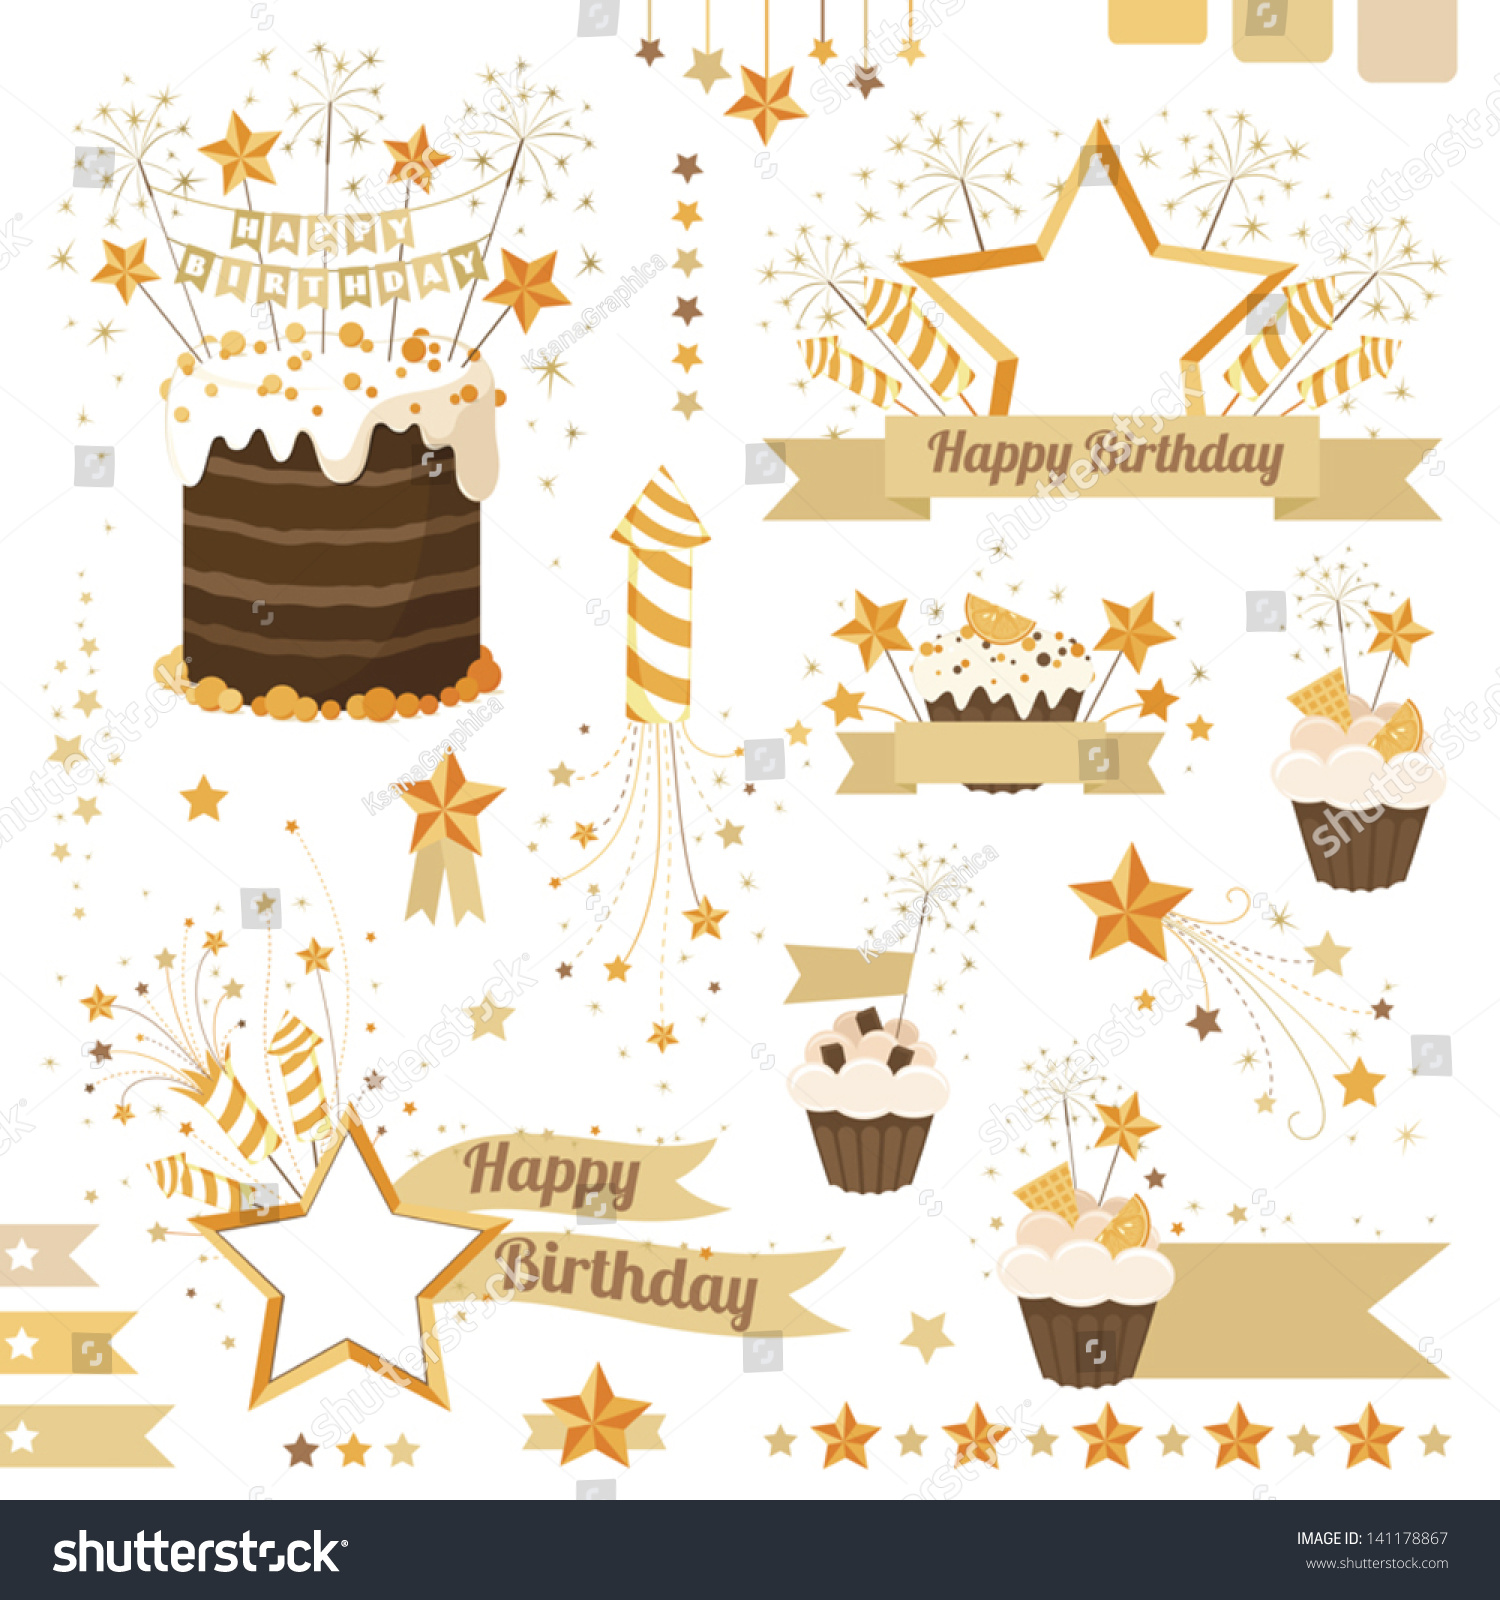 Birthday Celebration Design Elements Banners Borders Stock